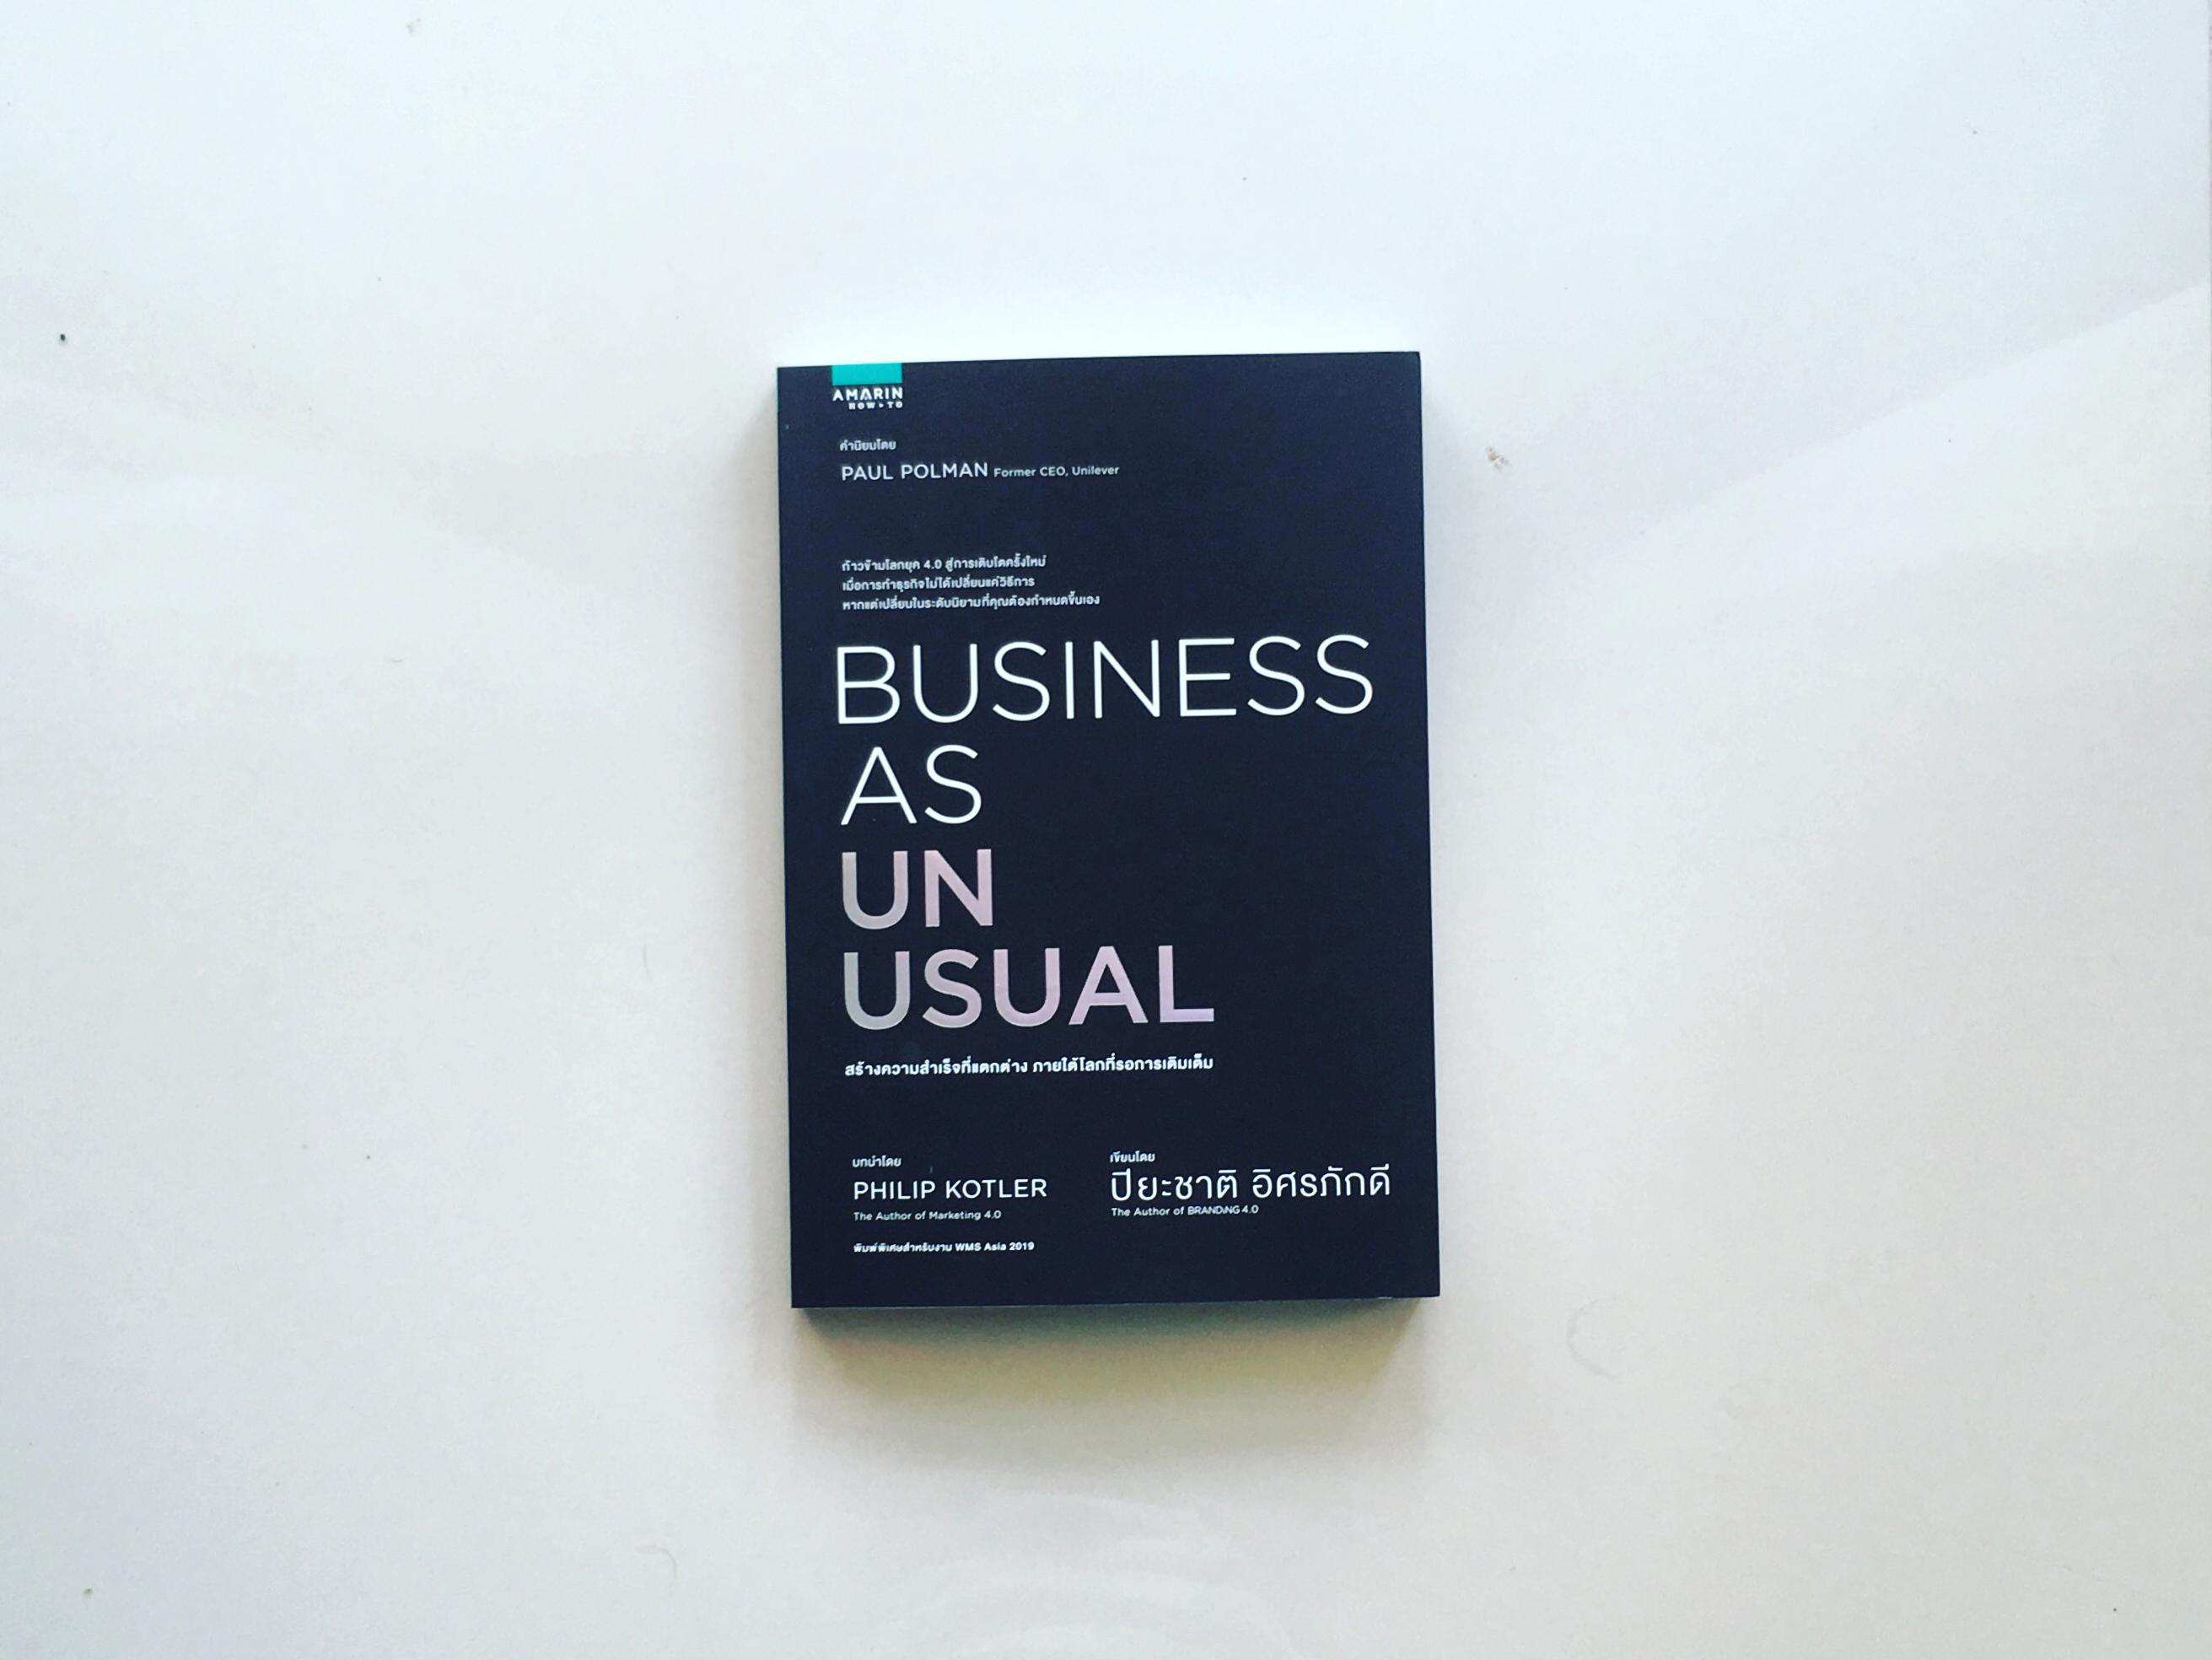 Business as Unusual BRANDi